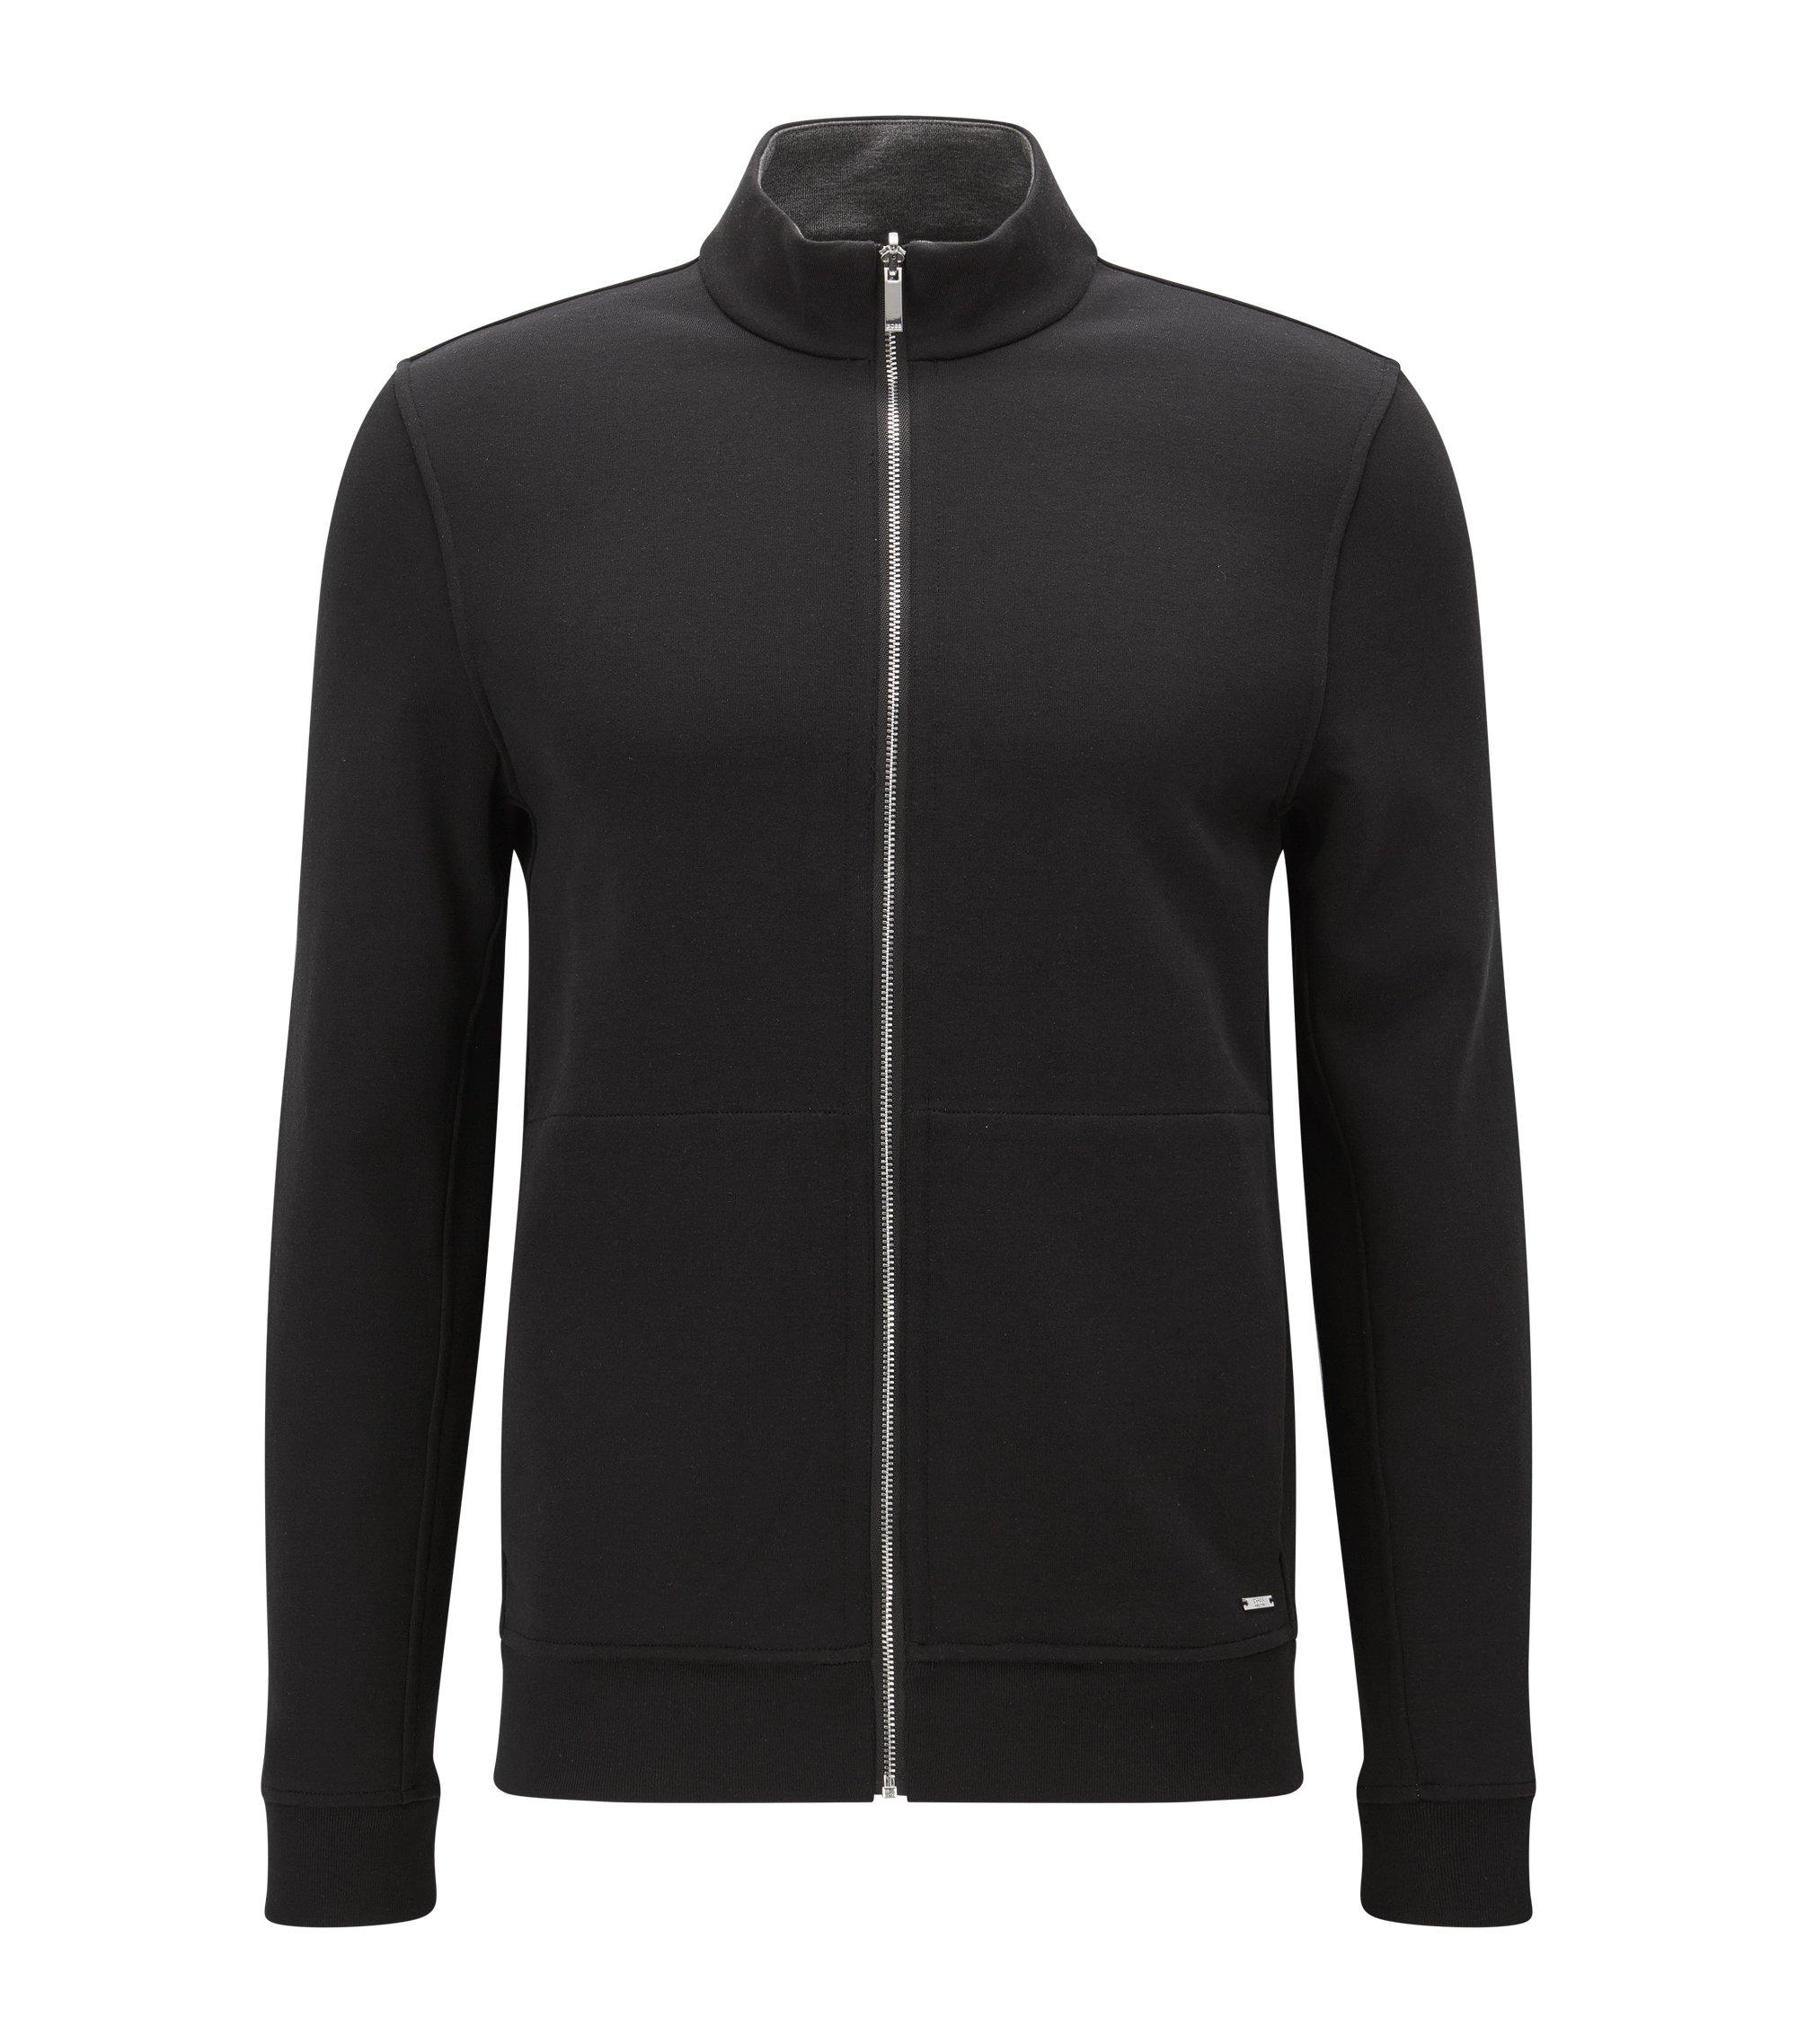 'Scavo' | Cotton Blend Full-Zip Sweater, Black